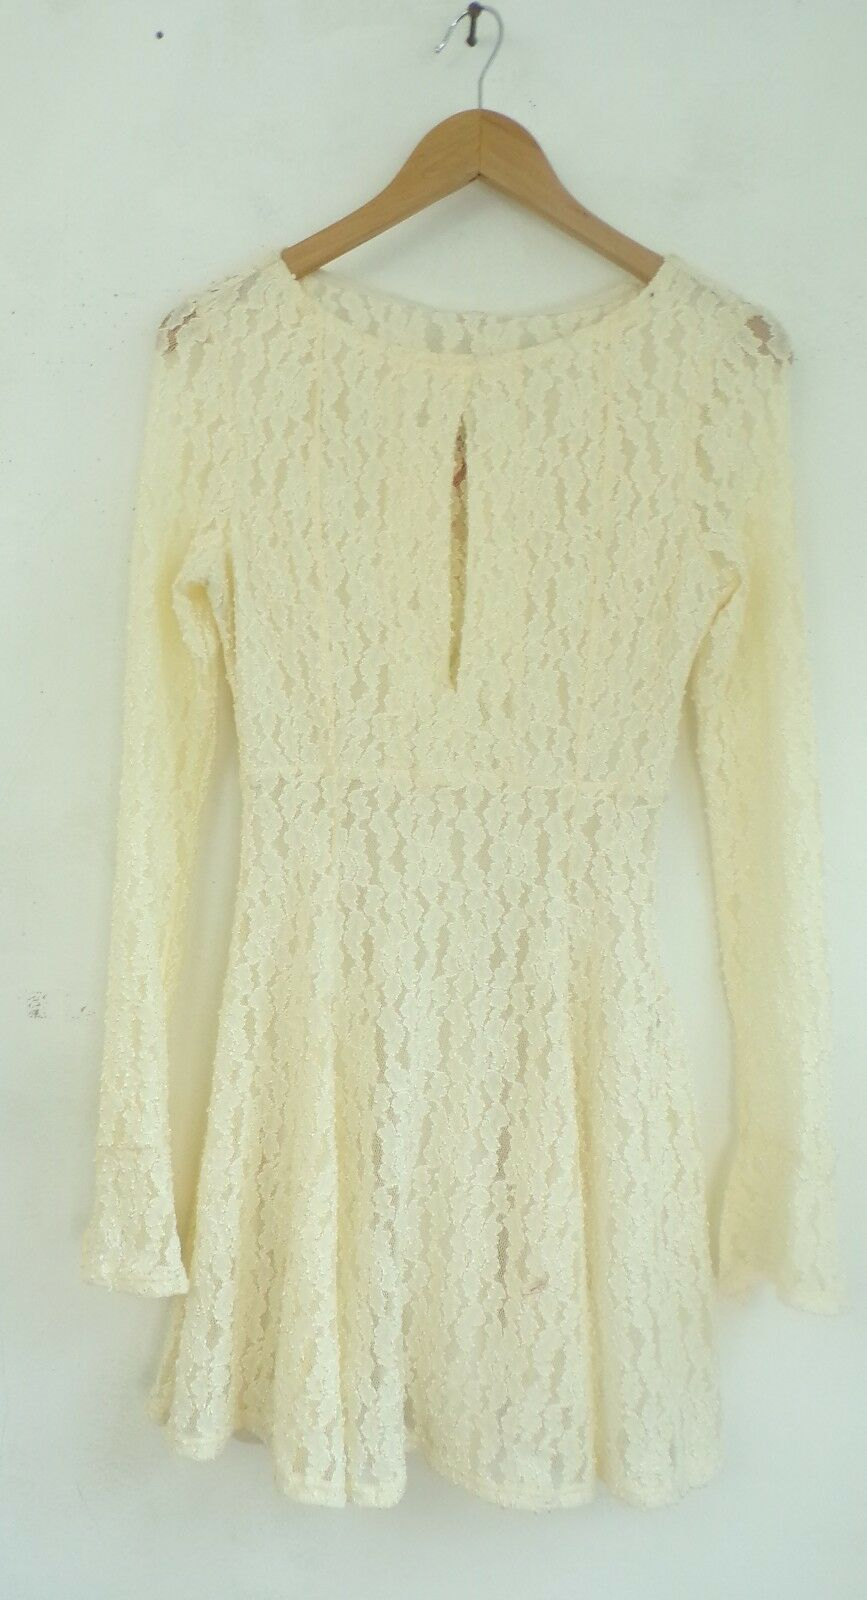 NWT FREE PEOPLE Dress Cream Lace Long Sleeve Boho Peasant Size Small RV